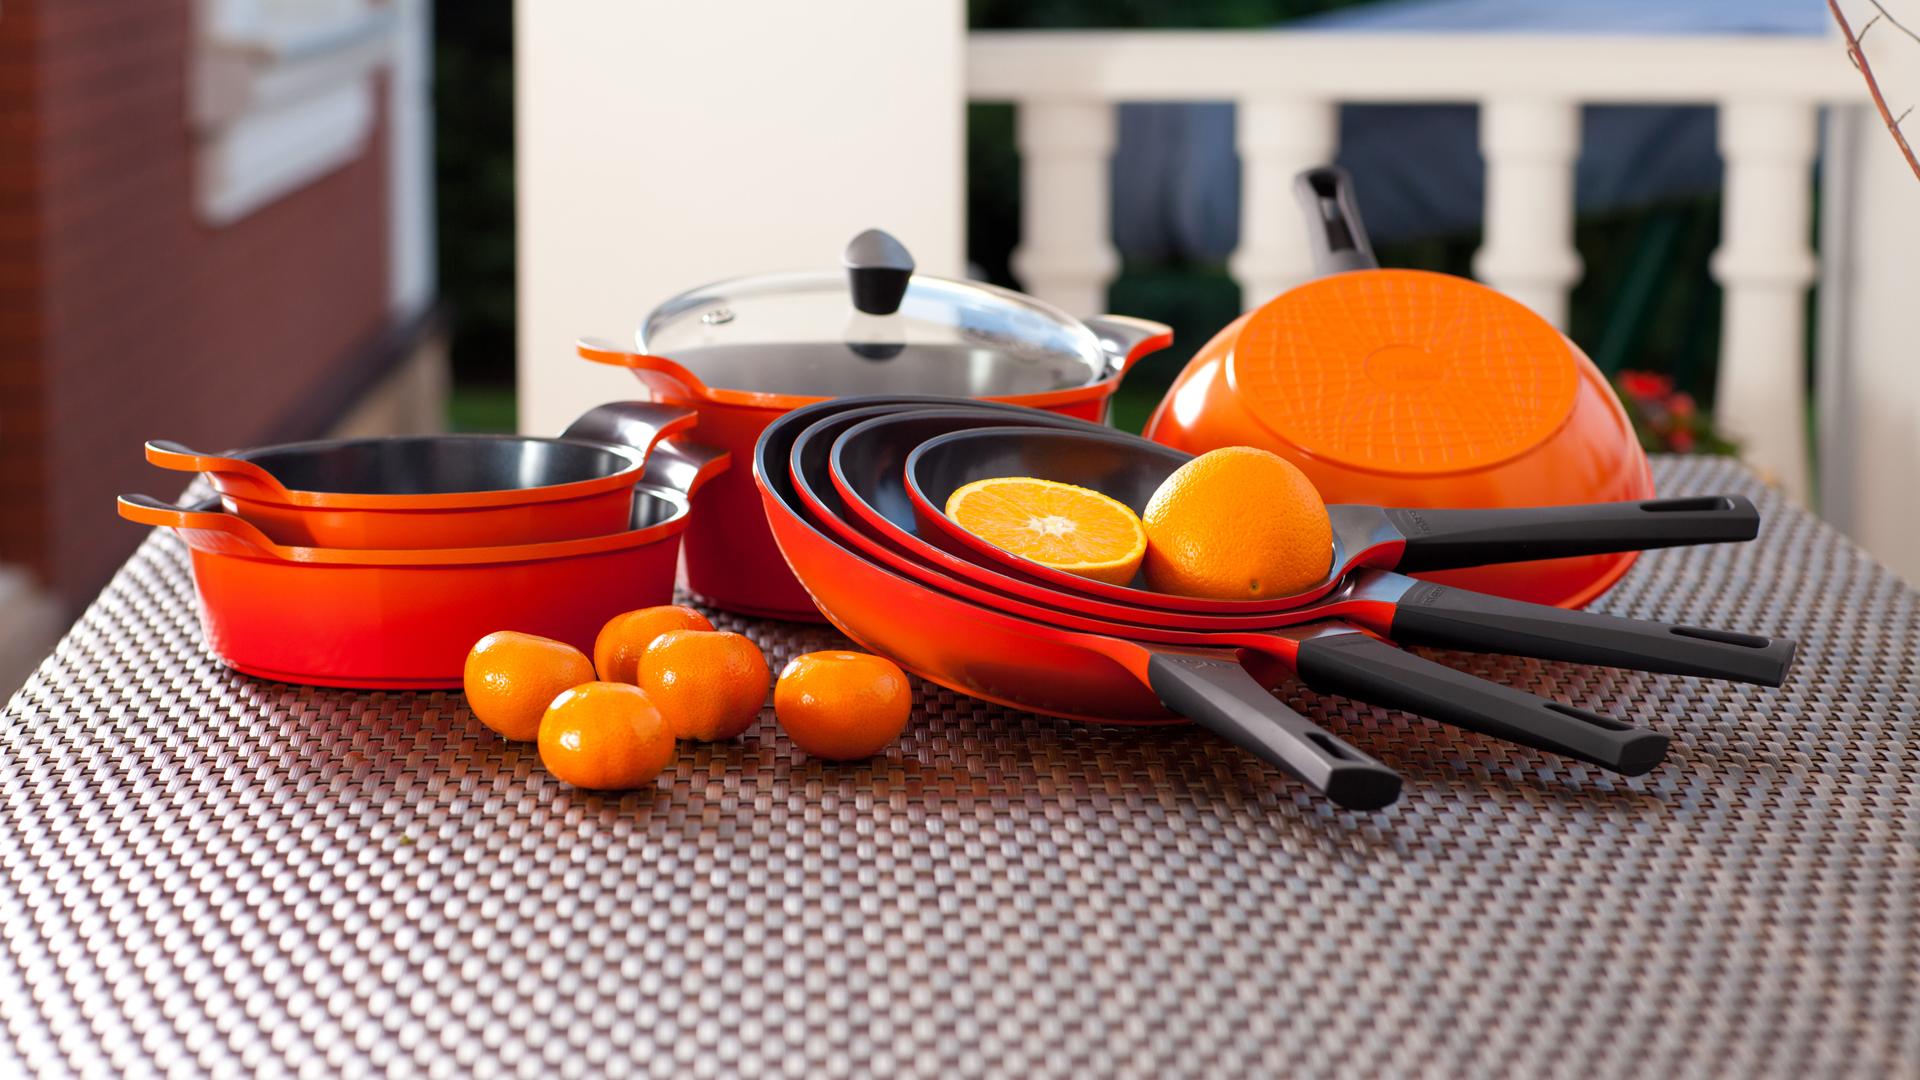 Набор сковородок на столе